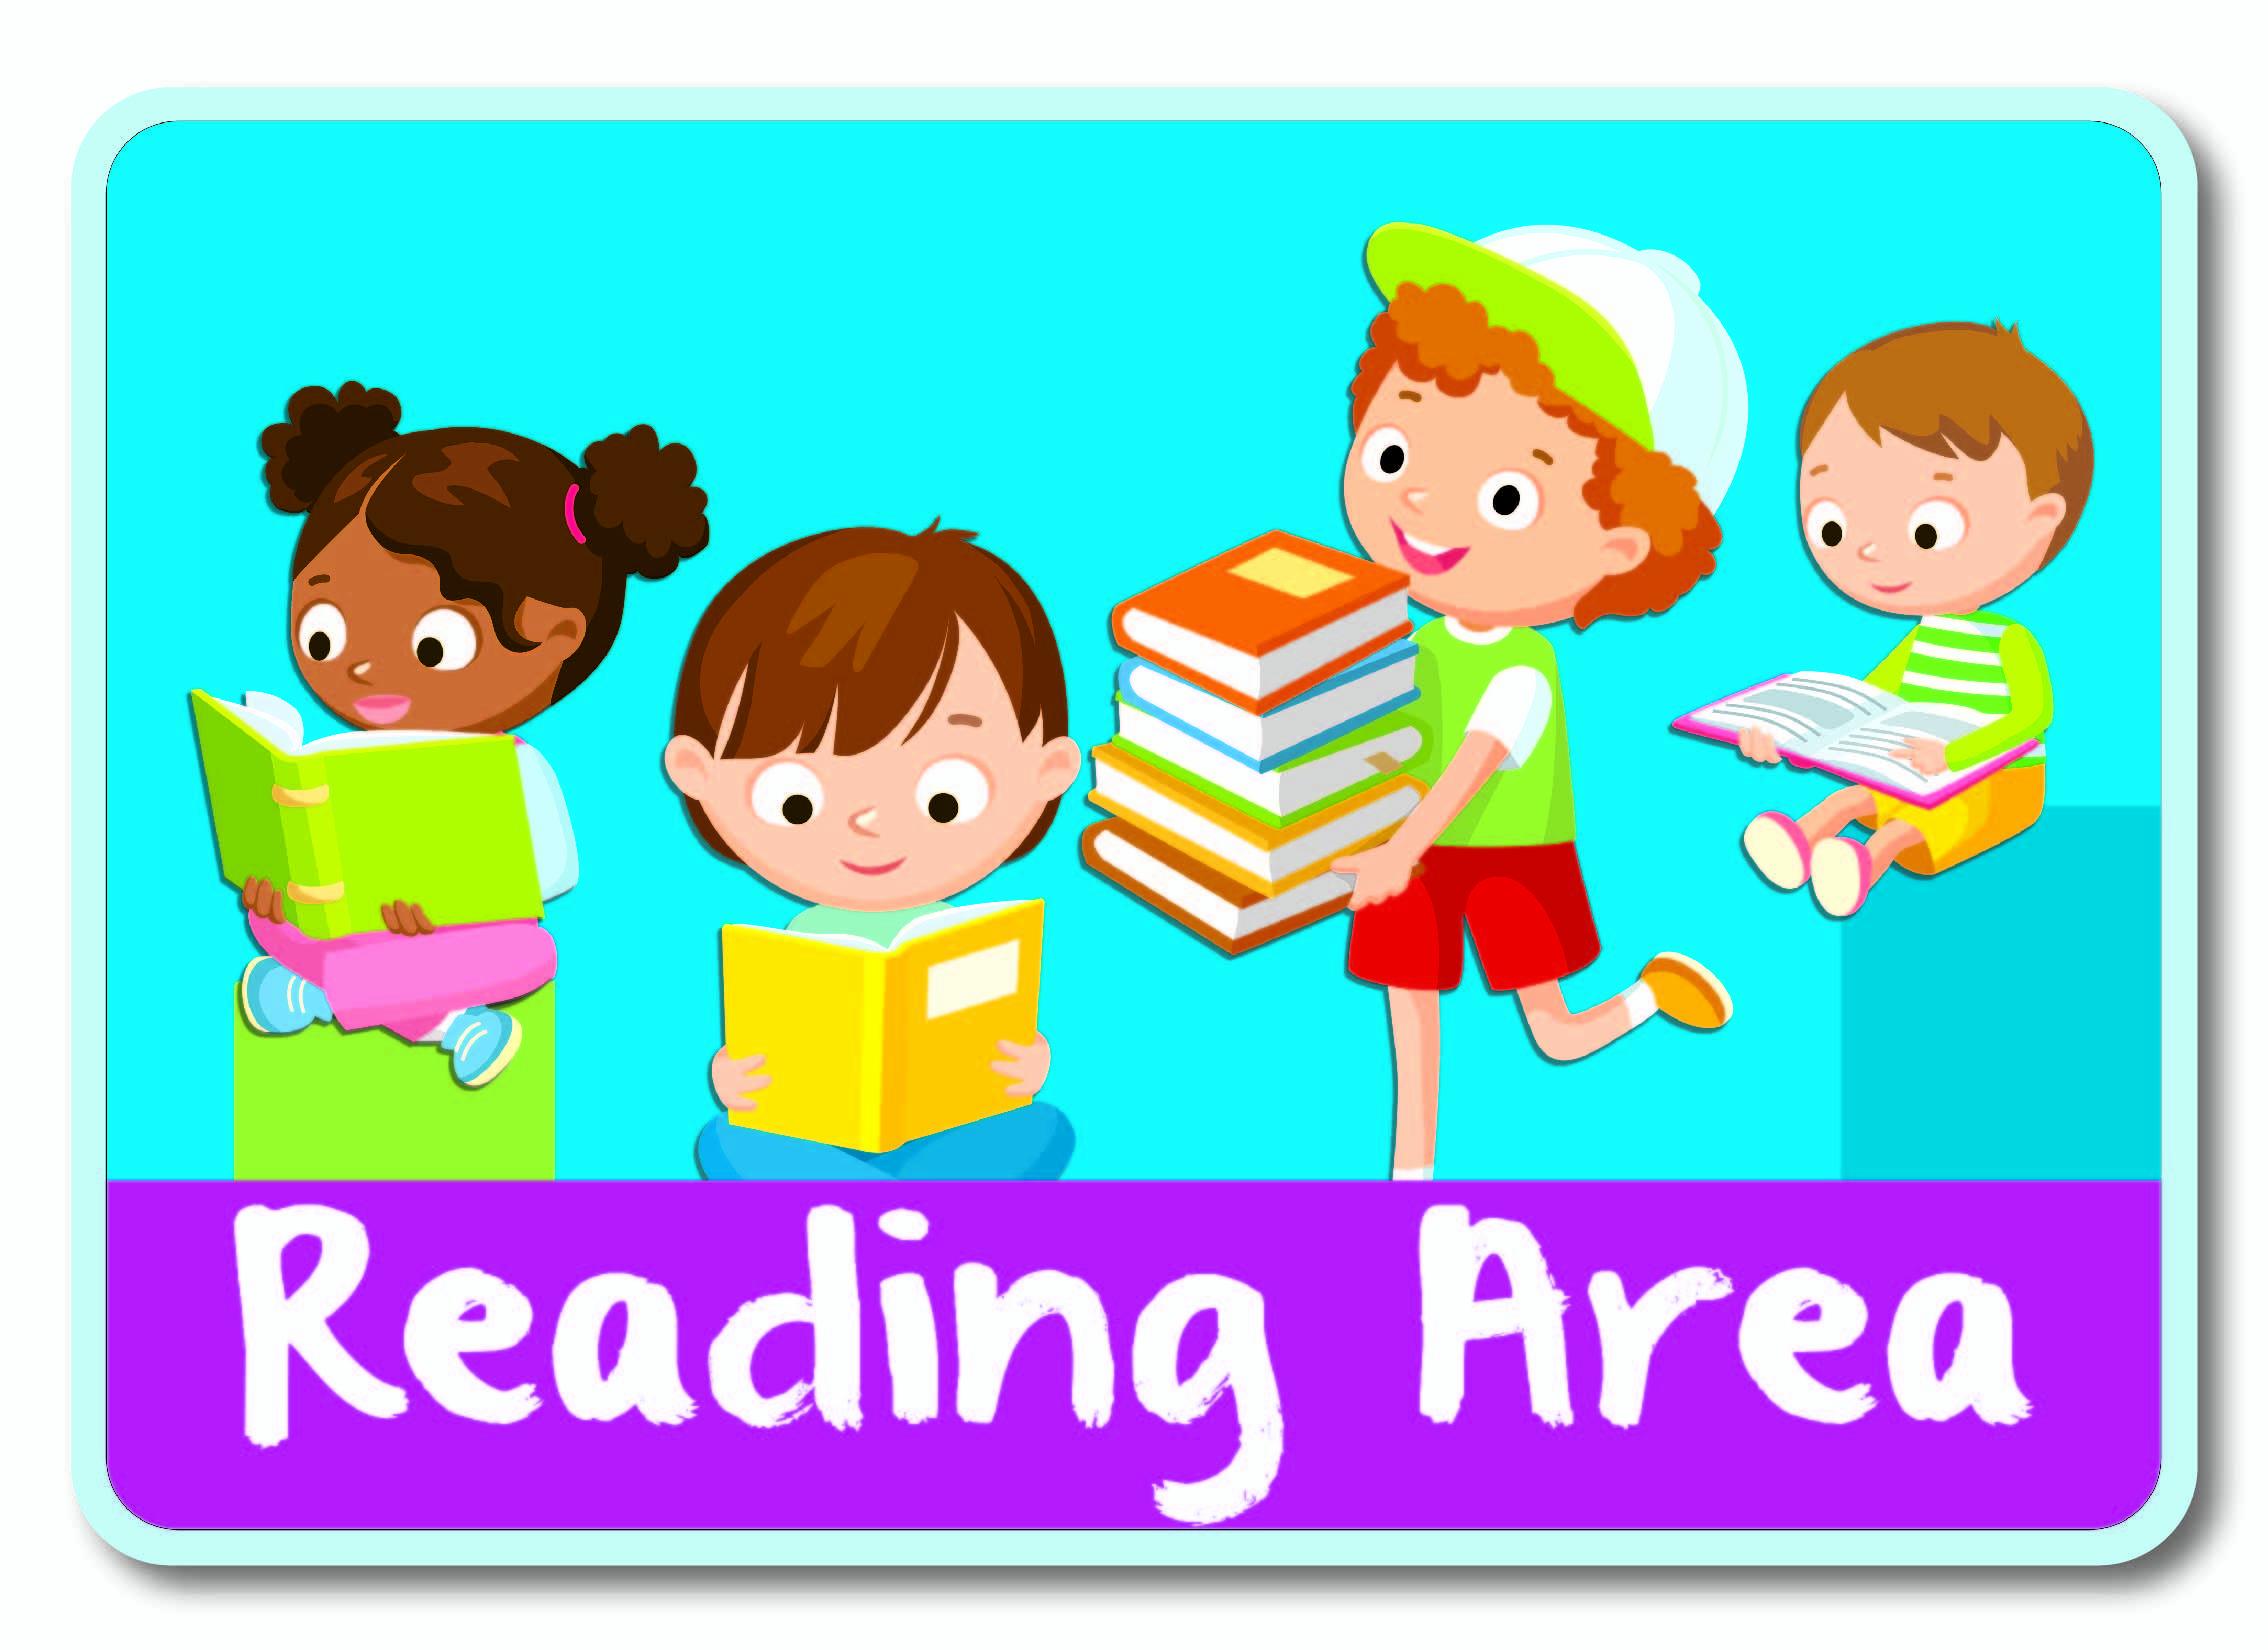 16 Area Clipart reading Free Clip Art stock illustrations.